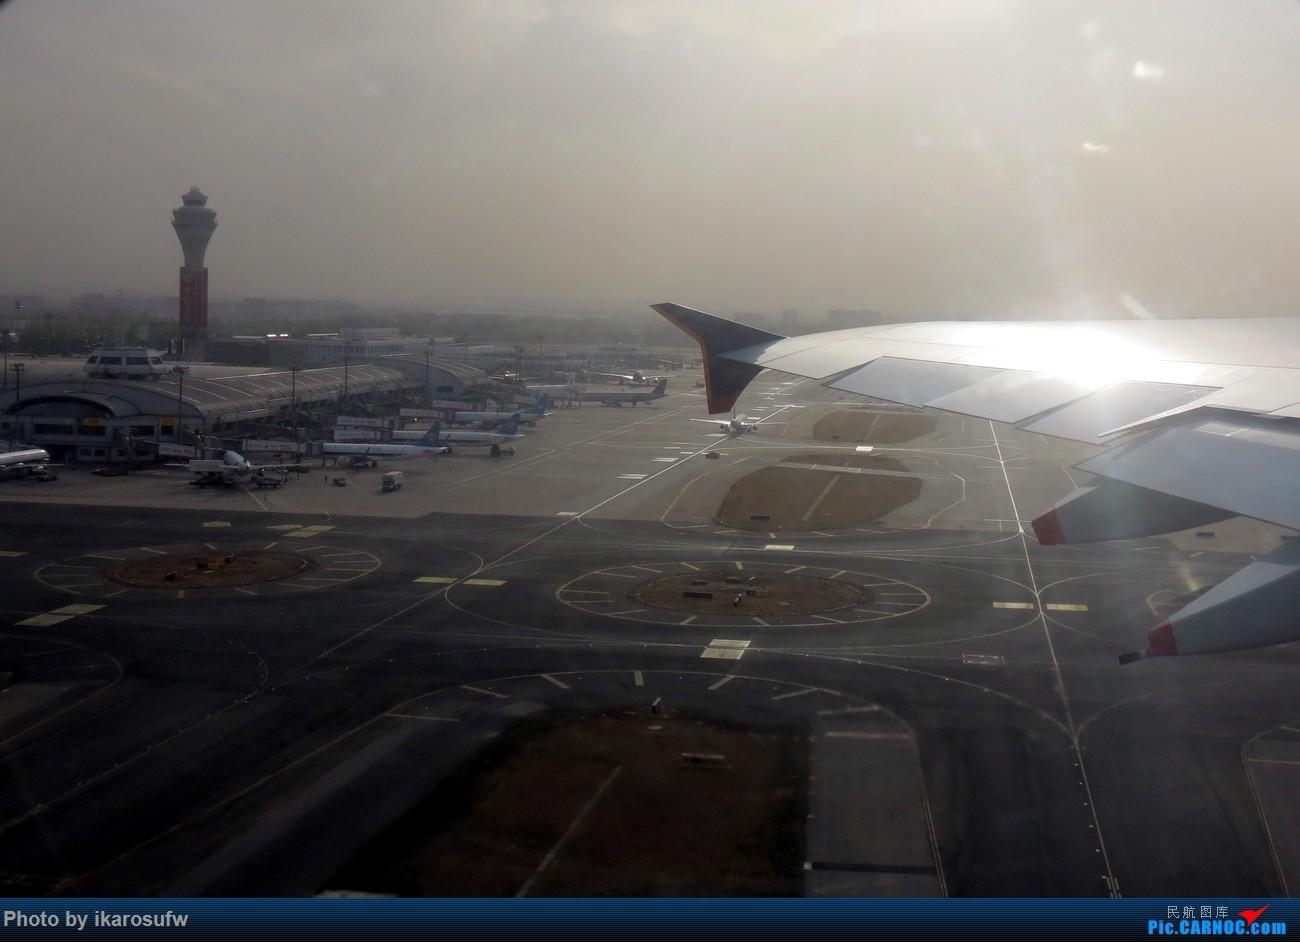 Re:[原创]再次新航380国航748 77W 新加坡-北京-上海-北京-新加坡全记录 新加坡航空SQ802/807 中国国际航空CA1522/1557(下)